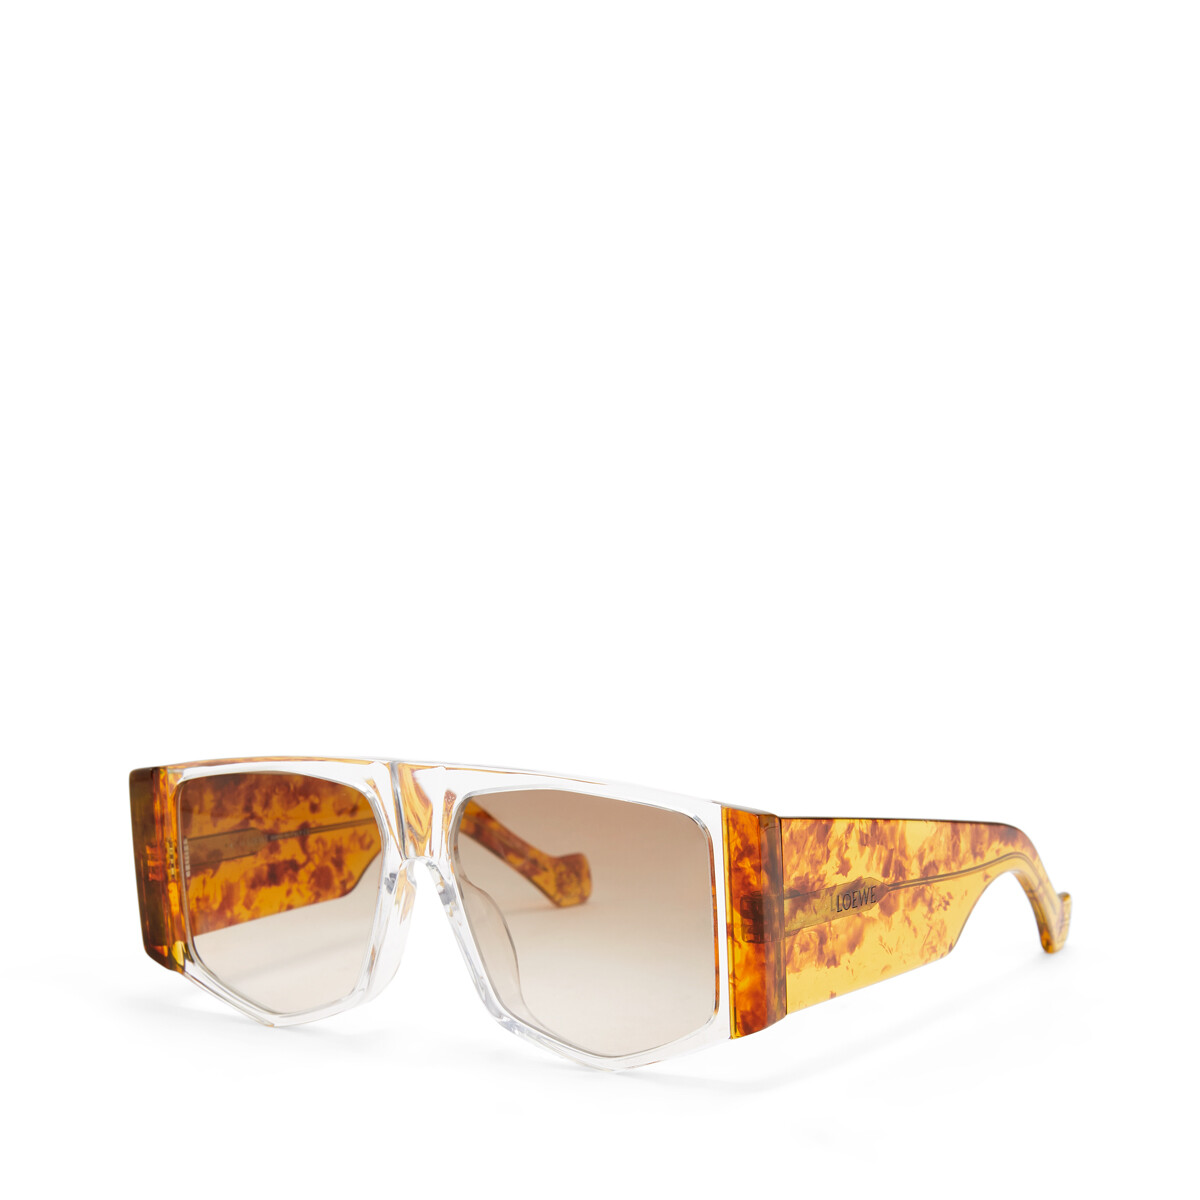 LOEWE Acetate Mask Sunglasses Amber/Gradient Brown front